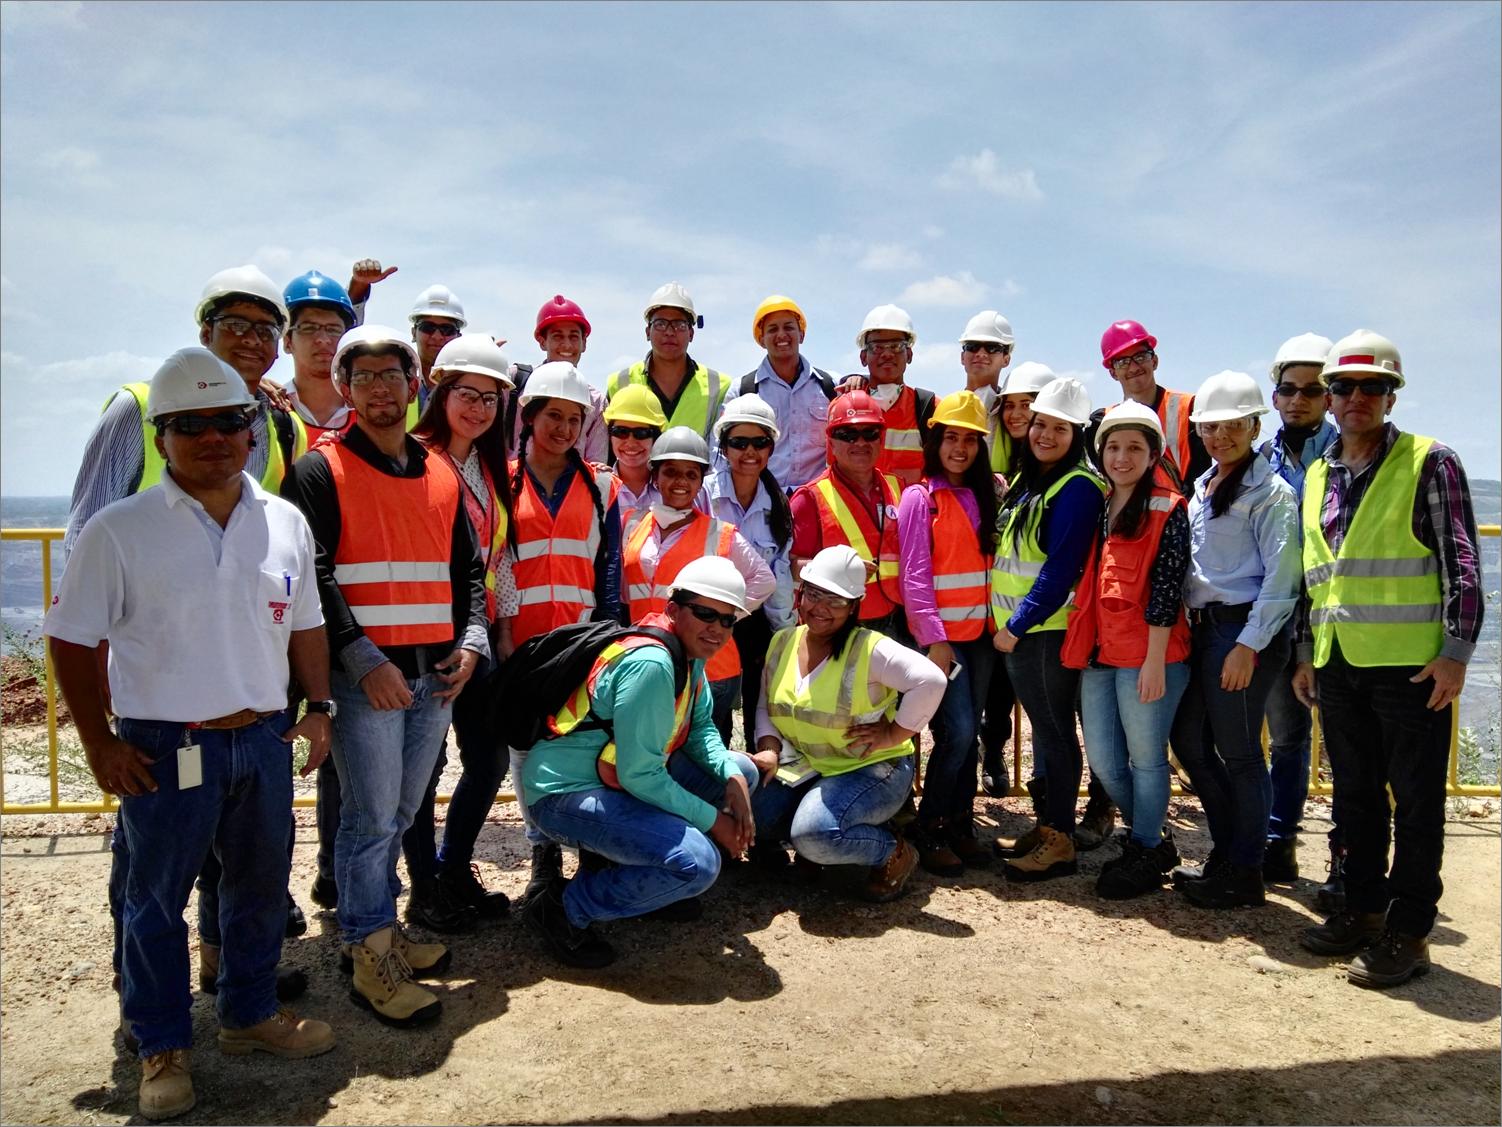 *Mining Engineering students from Fundacion Universitaria del Area Andina, Valledupar campus, are accompanied by Drummond Ltd.'s Communities Assistant, Leonardo Armenta, Professor Washington Roso, and Eulises Cardenas, Industrial Safety Director.